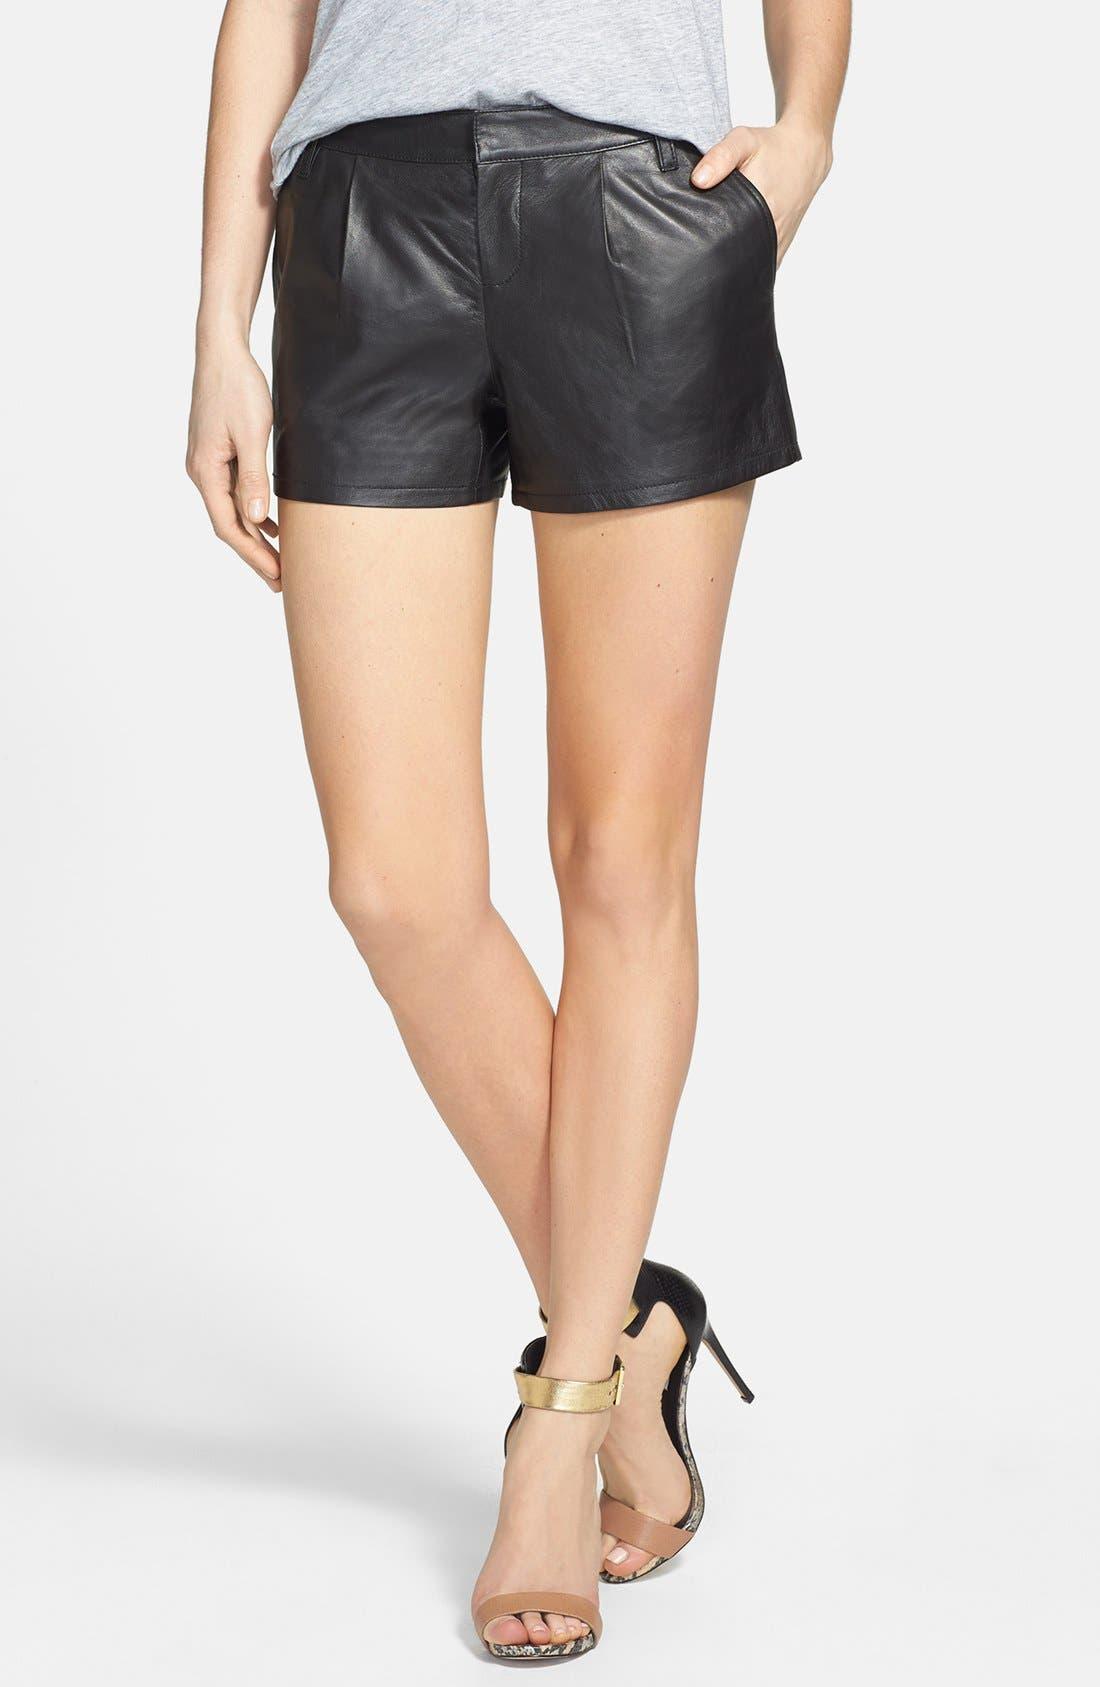 Alternate Image 1 Selected - Halogen® Leather Shorts (Regular & Petite) (Online Only)